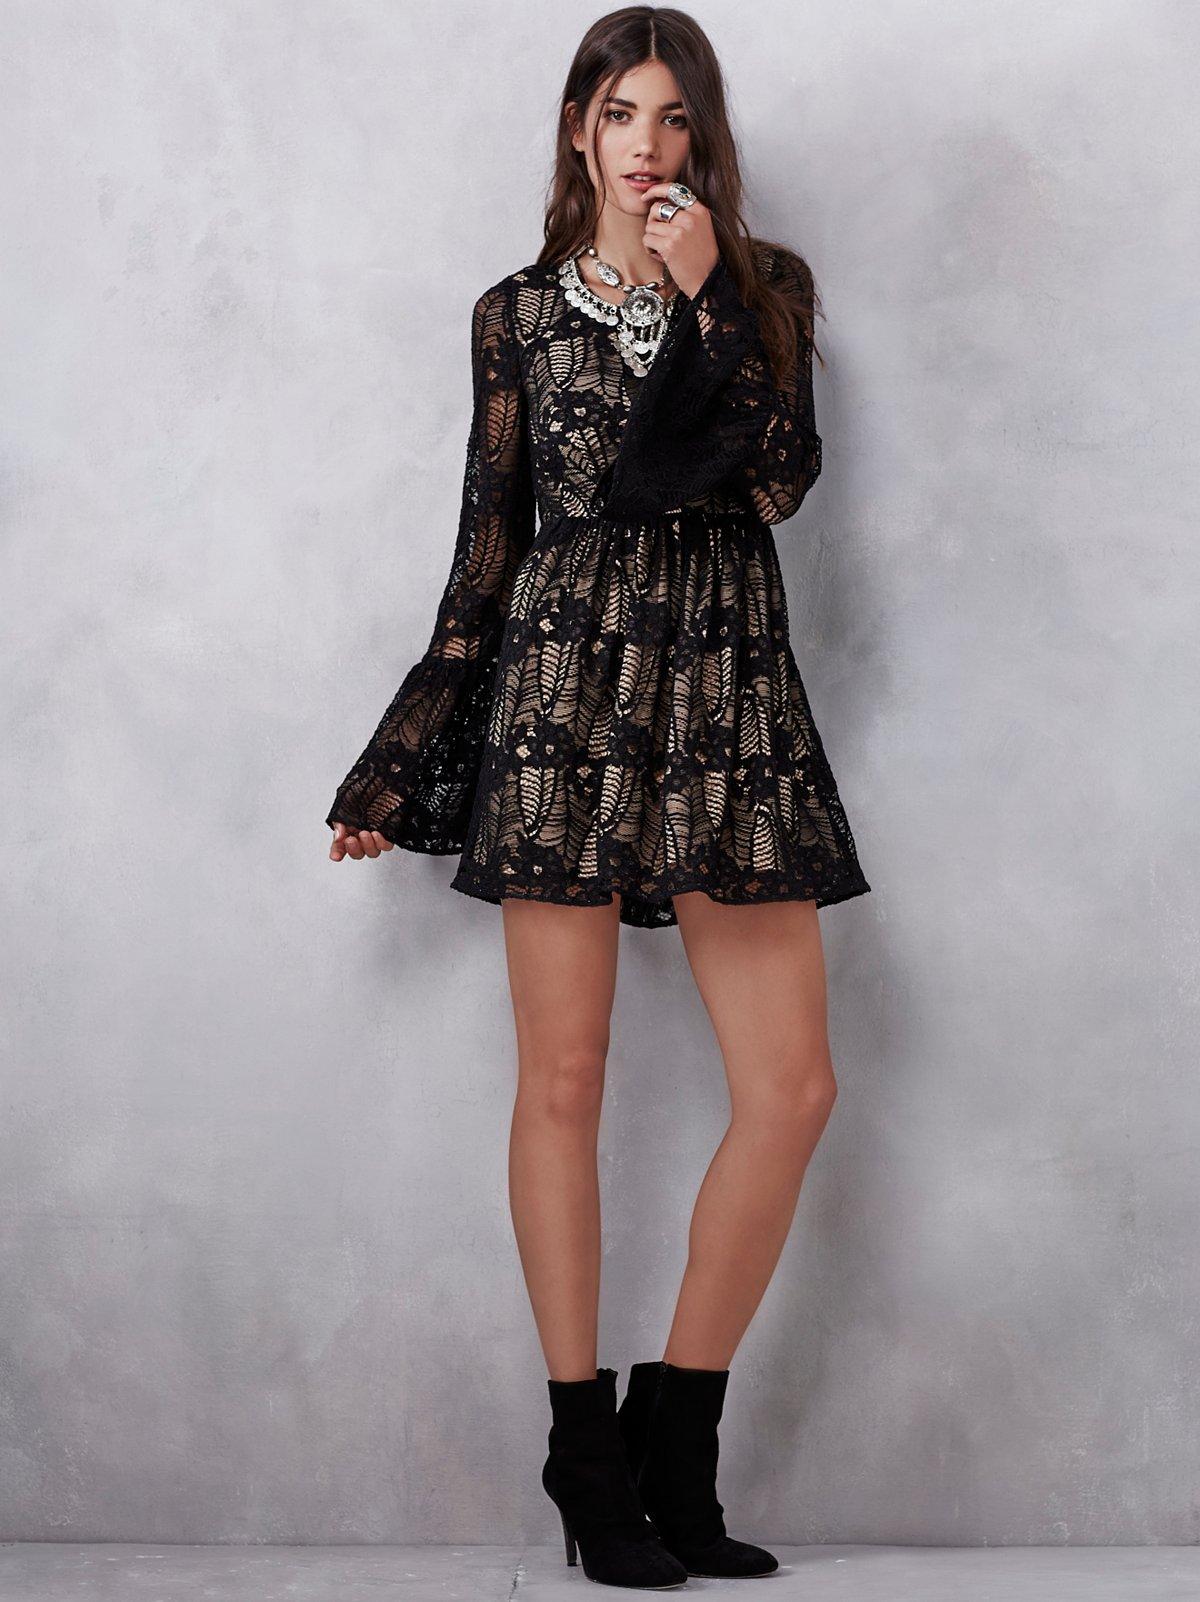 Dulce Mini Dress